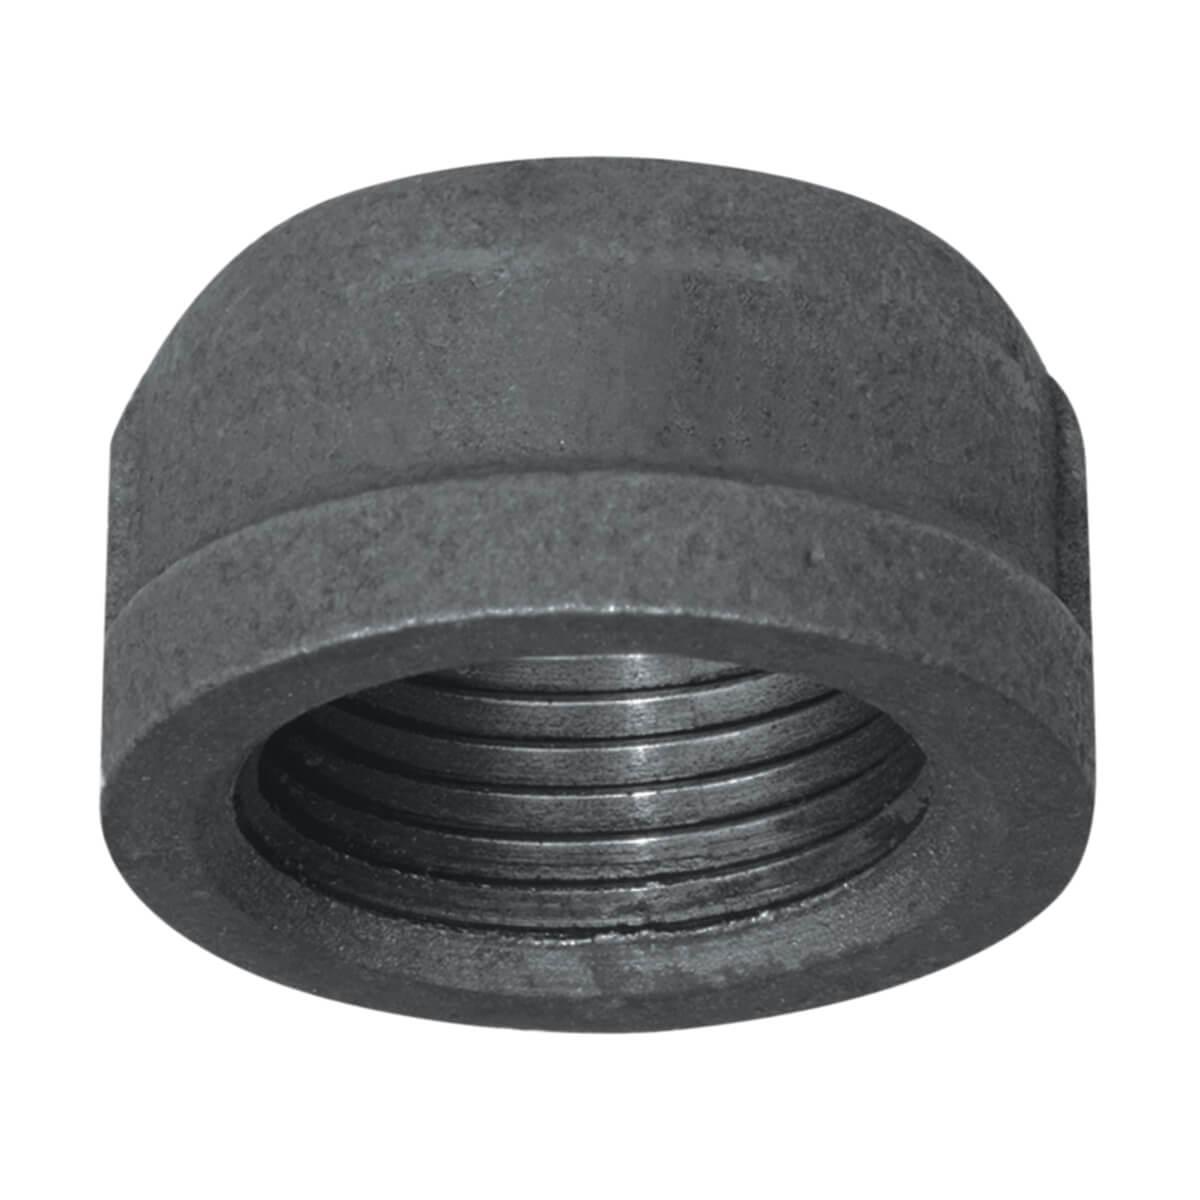 "Fitting Black Iron Cap 3/4"""